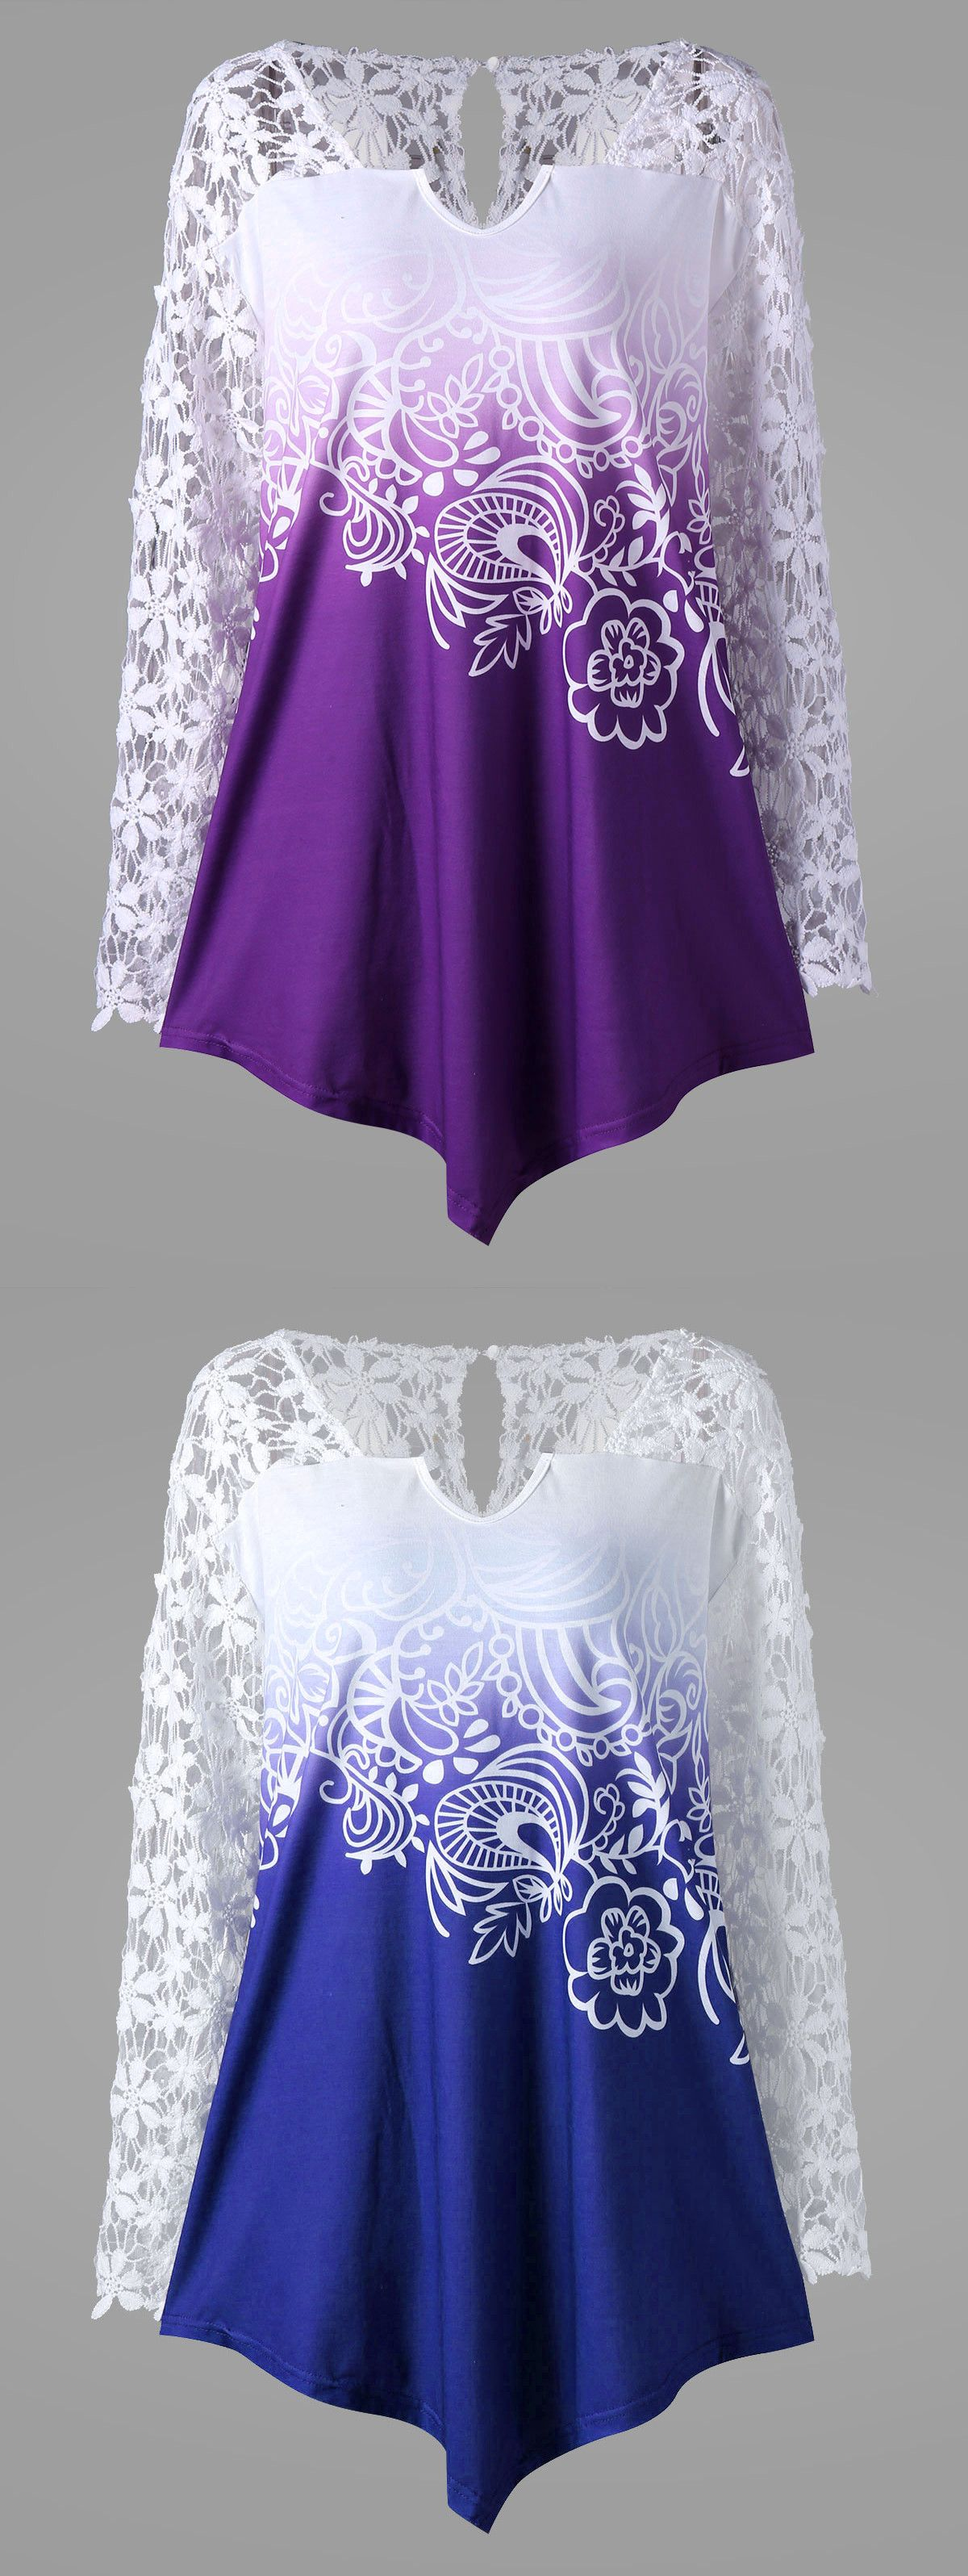 Plus size lace yoke ombre top purple xl ombre clothes and